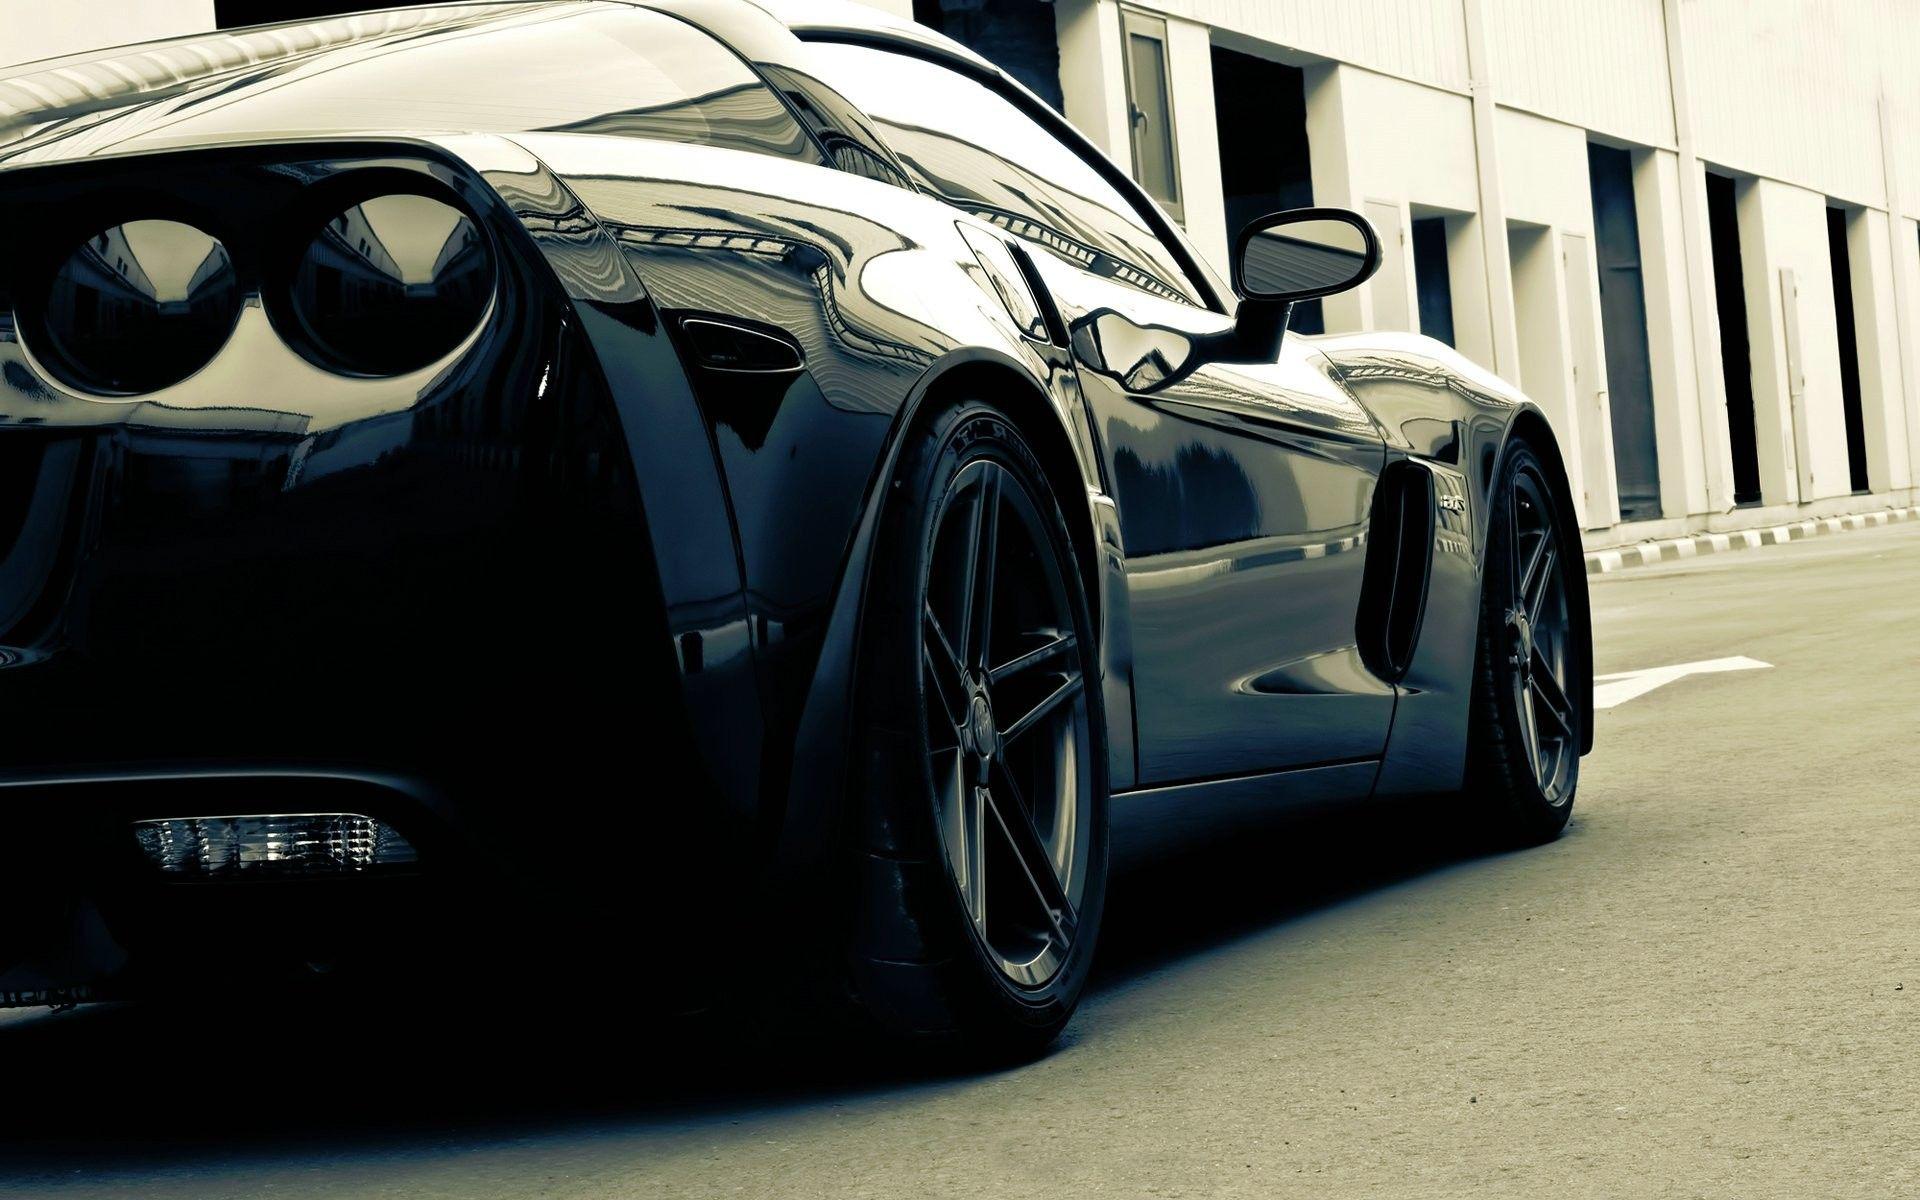 Cars Photography Vehicles Corvette Black Cars 1920x1200 Wallpaper Corvette Car Car Classic Cars